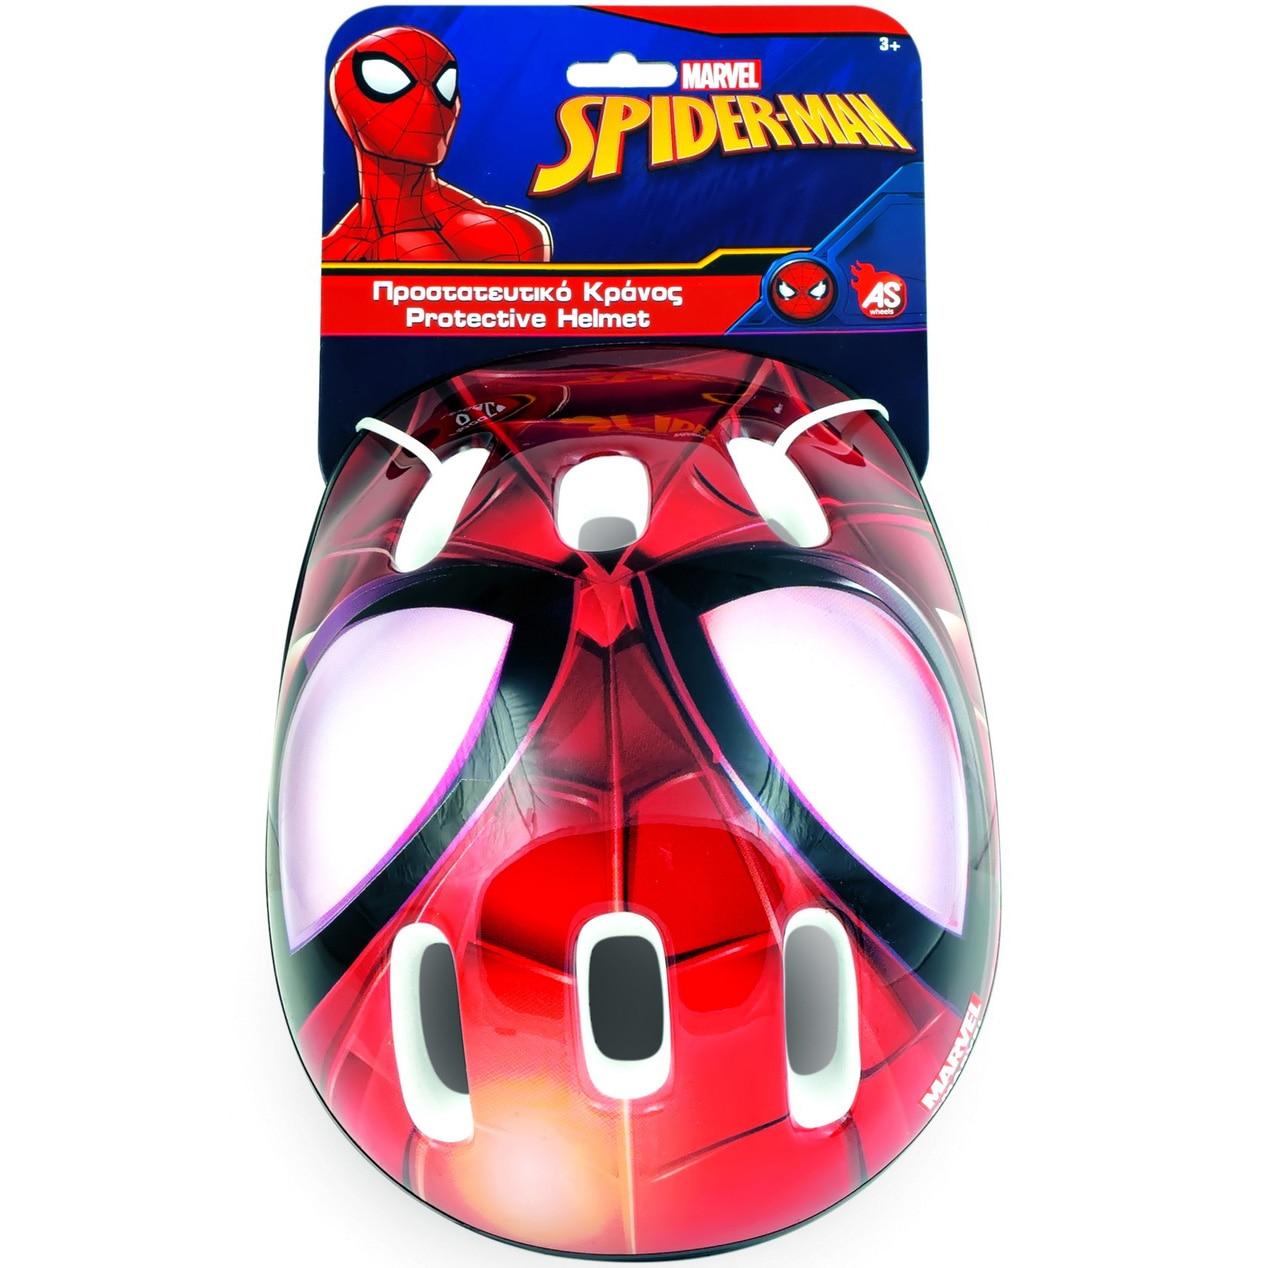 Fotografie Casca de protectie AS Spiderman, 3+ ani